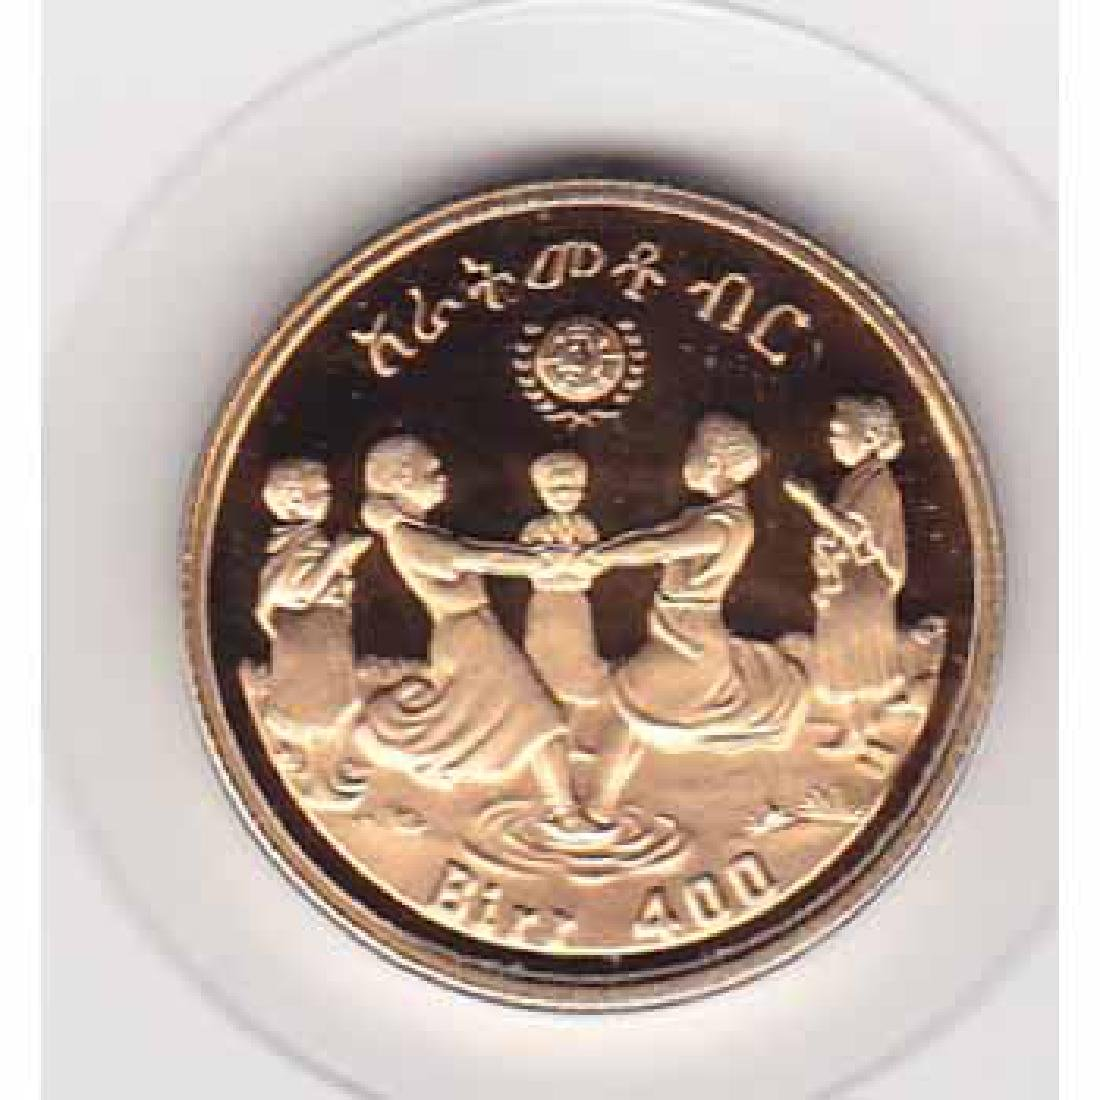 Ethiopia 400 birr gold PF 1979 Year of the Child